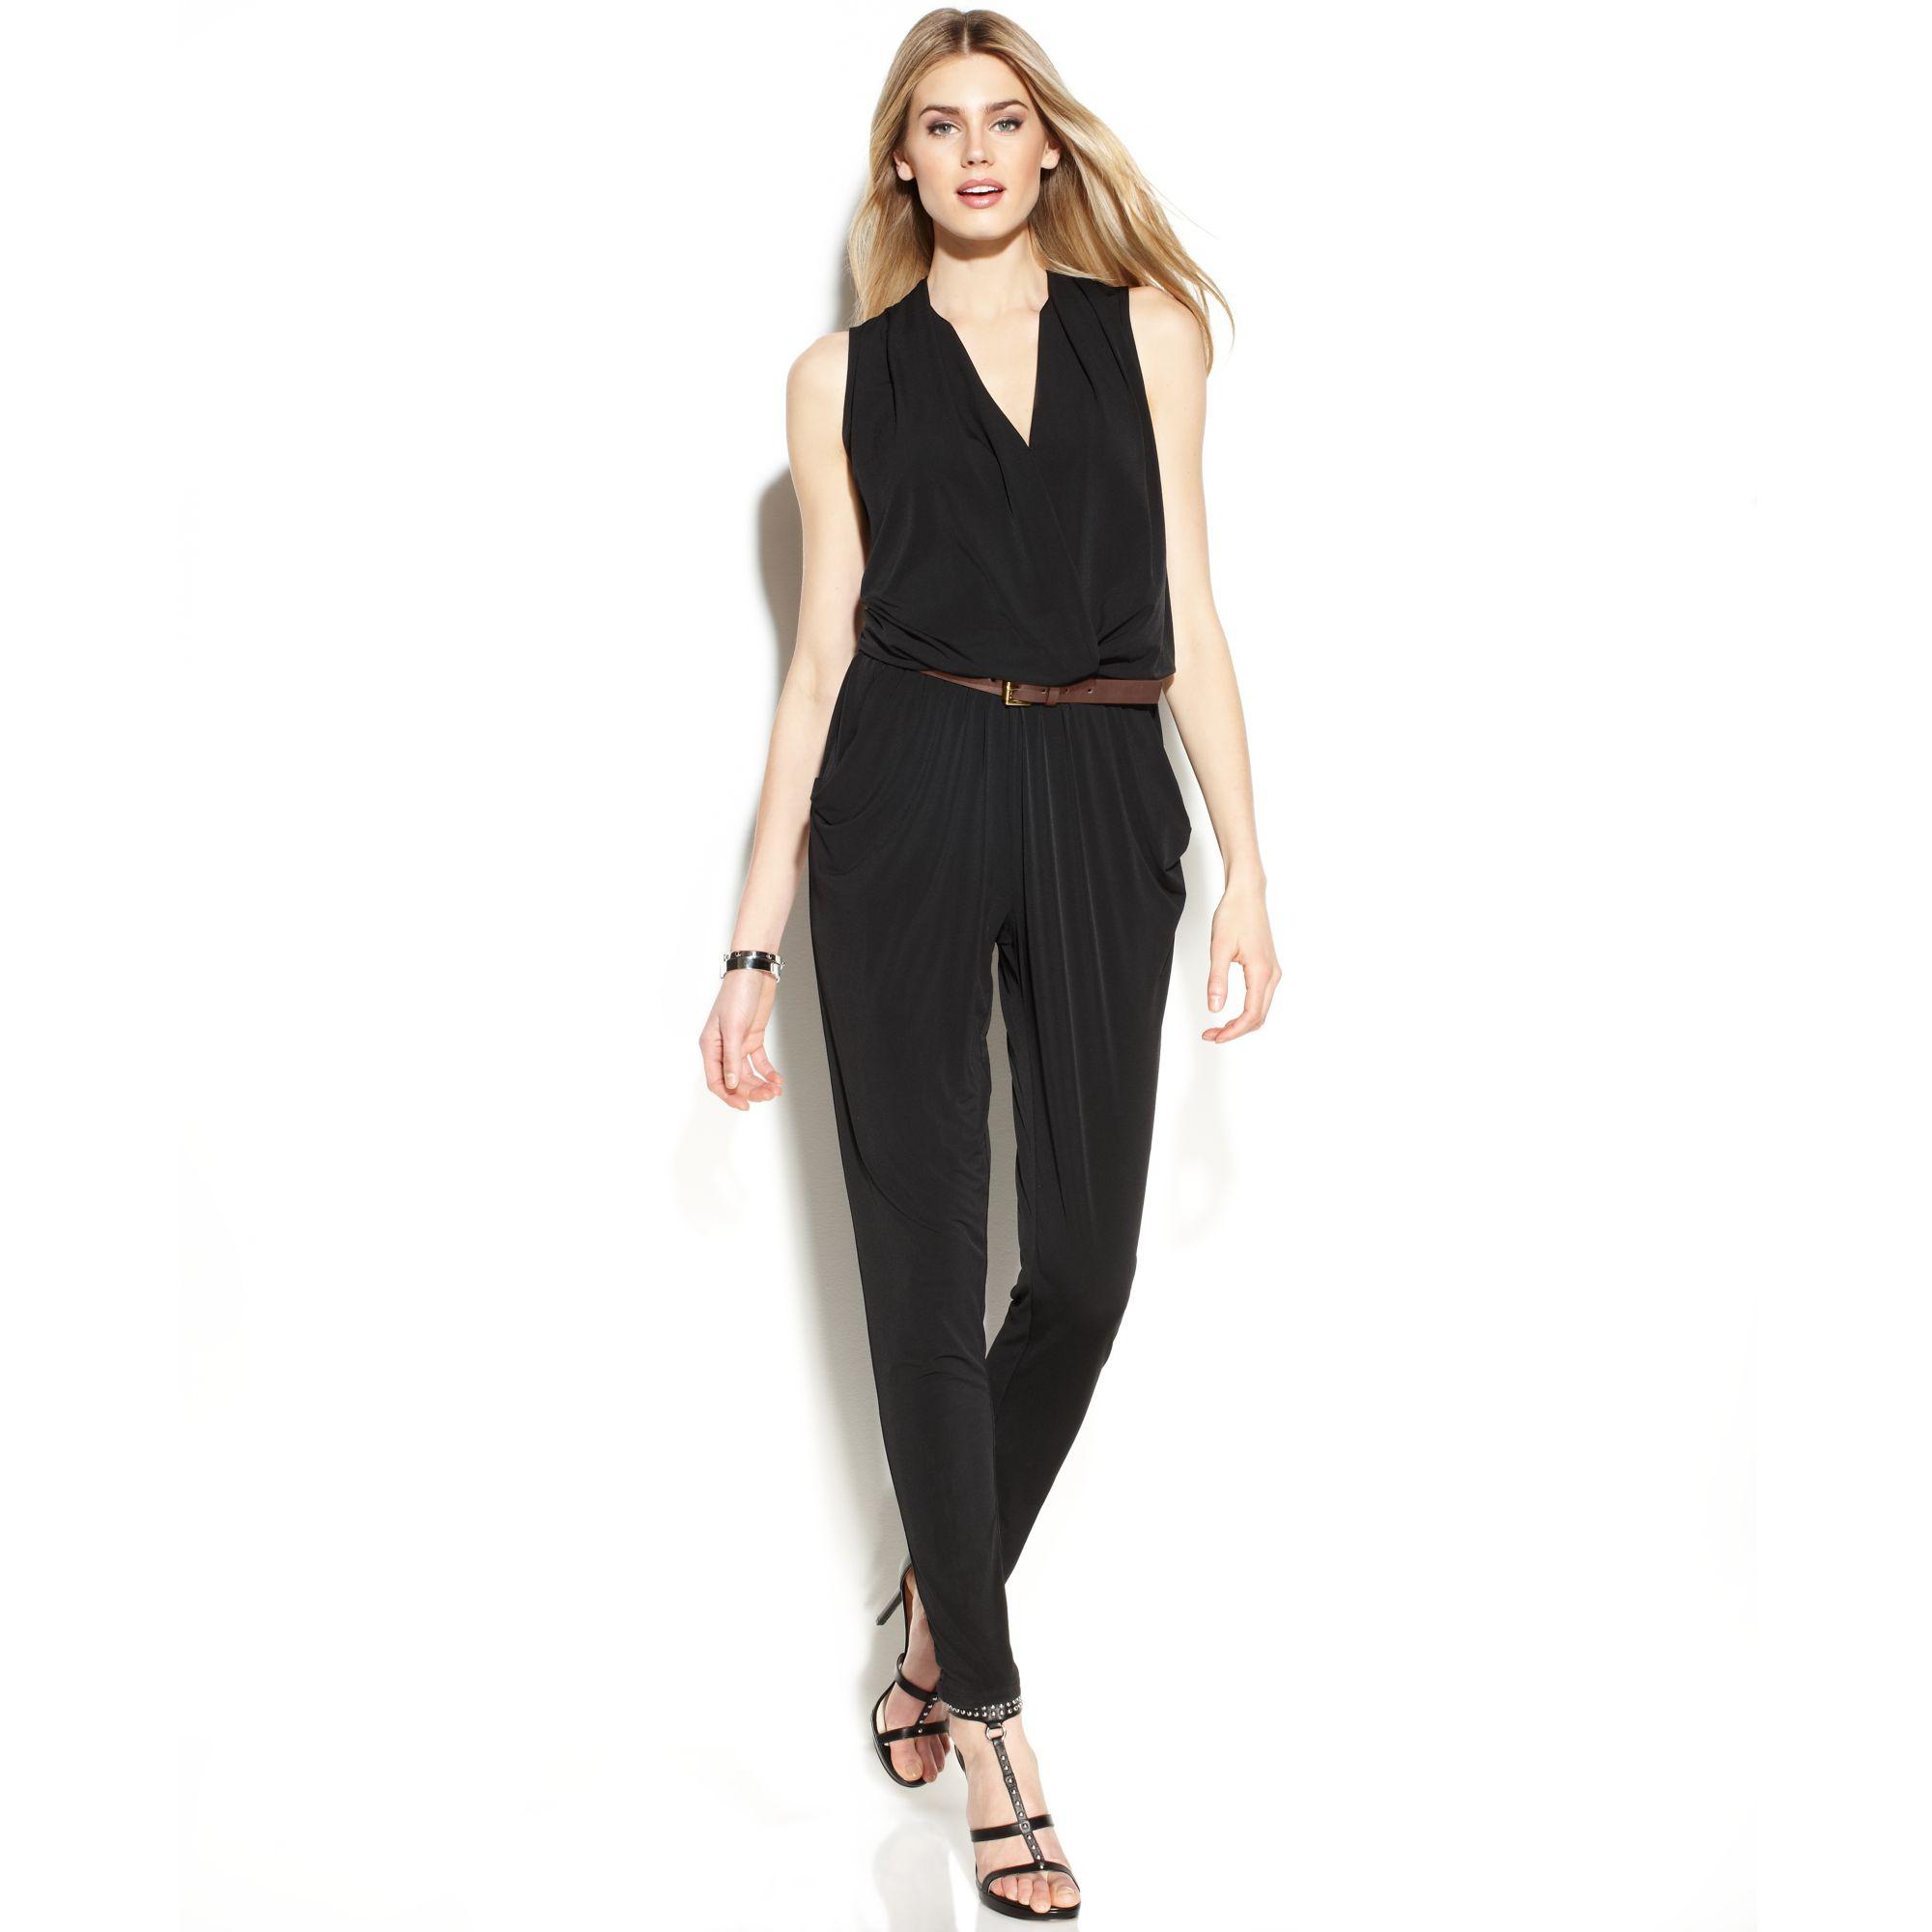 michael kors michael sleeveless belted jumpsuit in black lyst. Black Bedroom Furniture Sets. Home Design Ideas